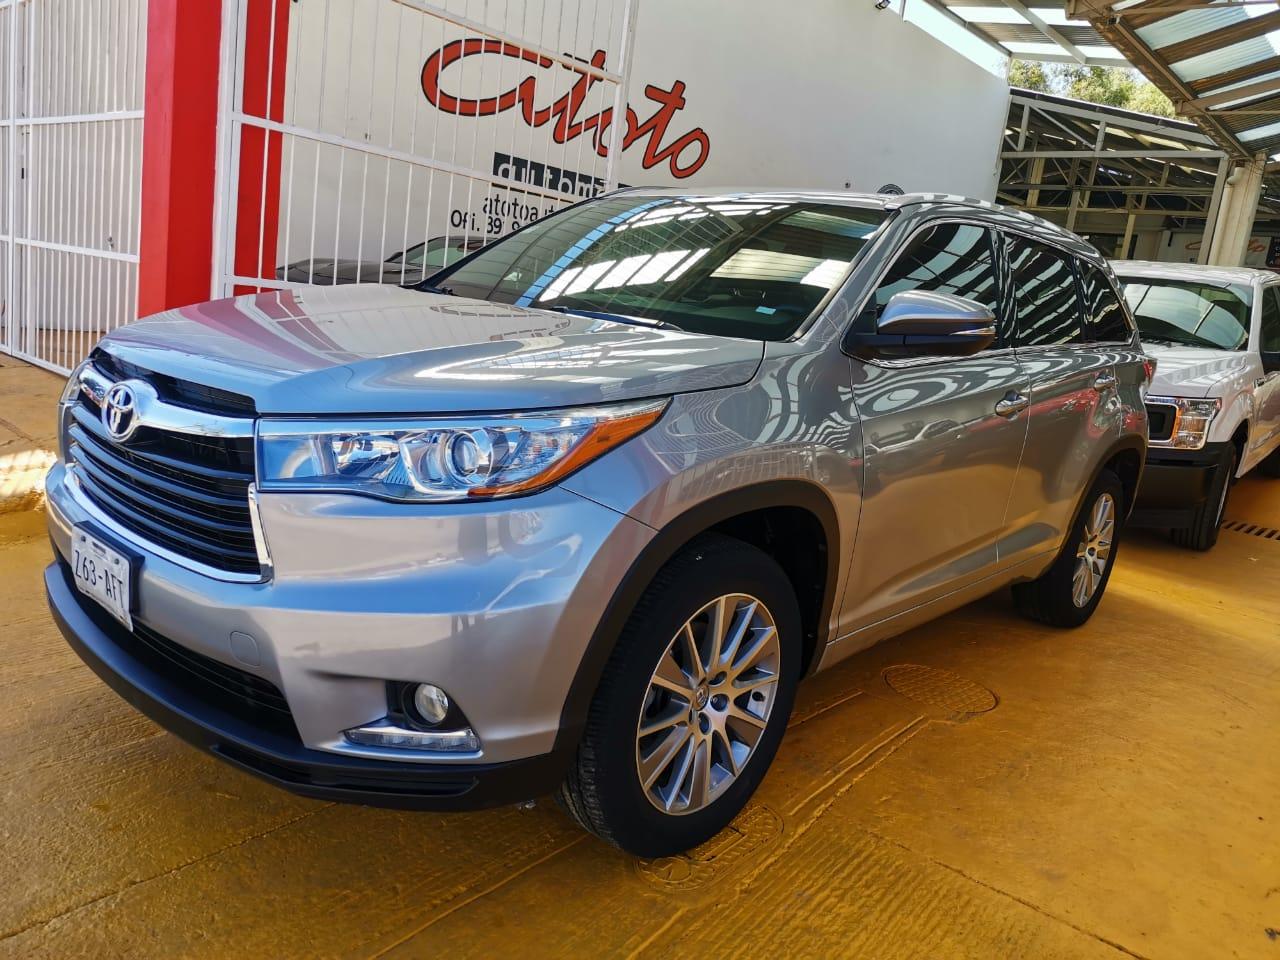 Toyota Highlander 2015 limited